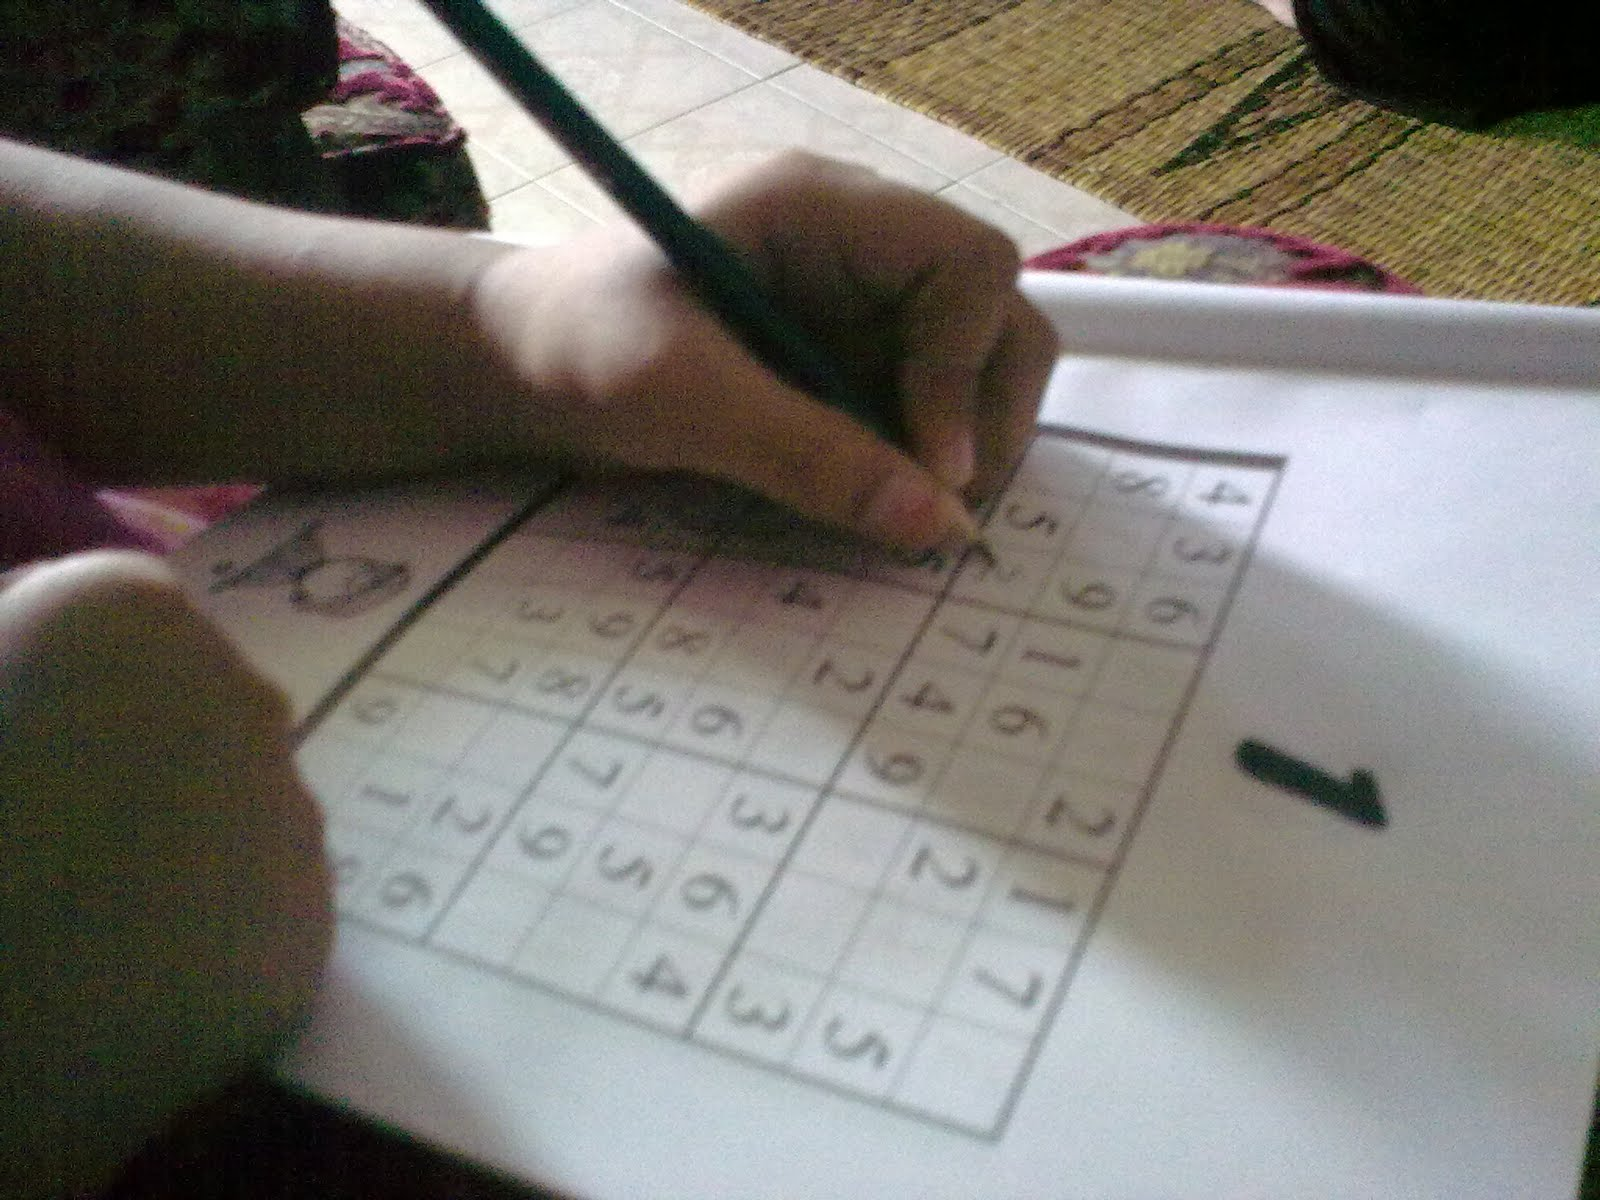 Download free Buku Sudoku for windows 10 current version - coolwfil